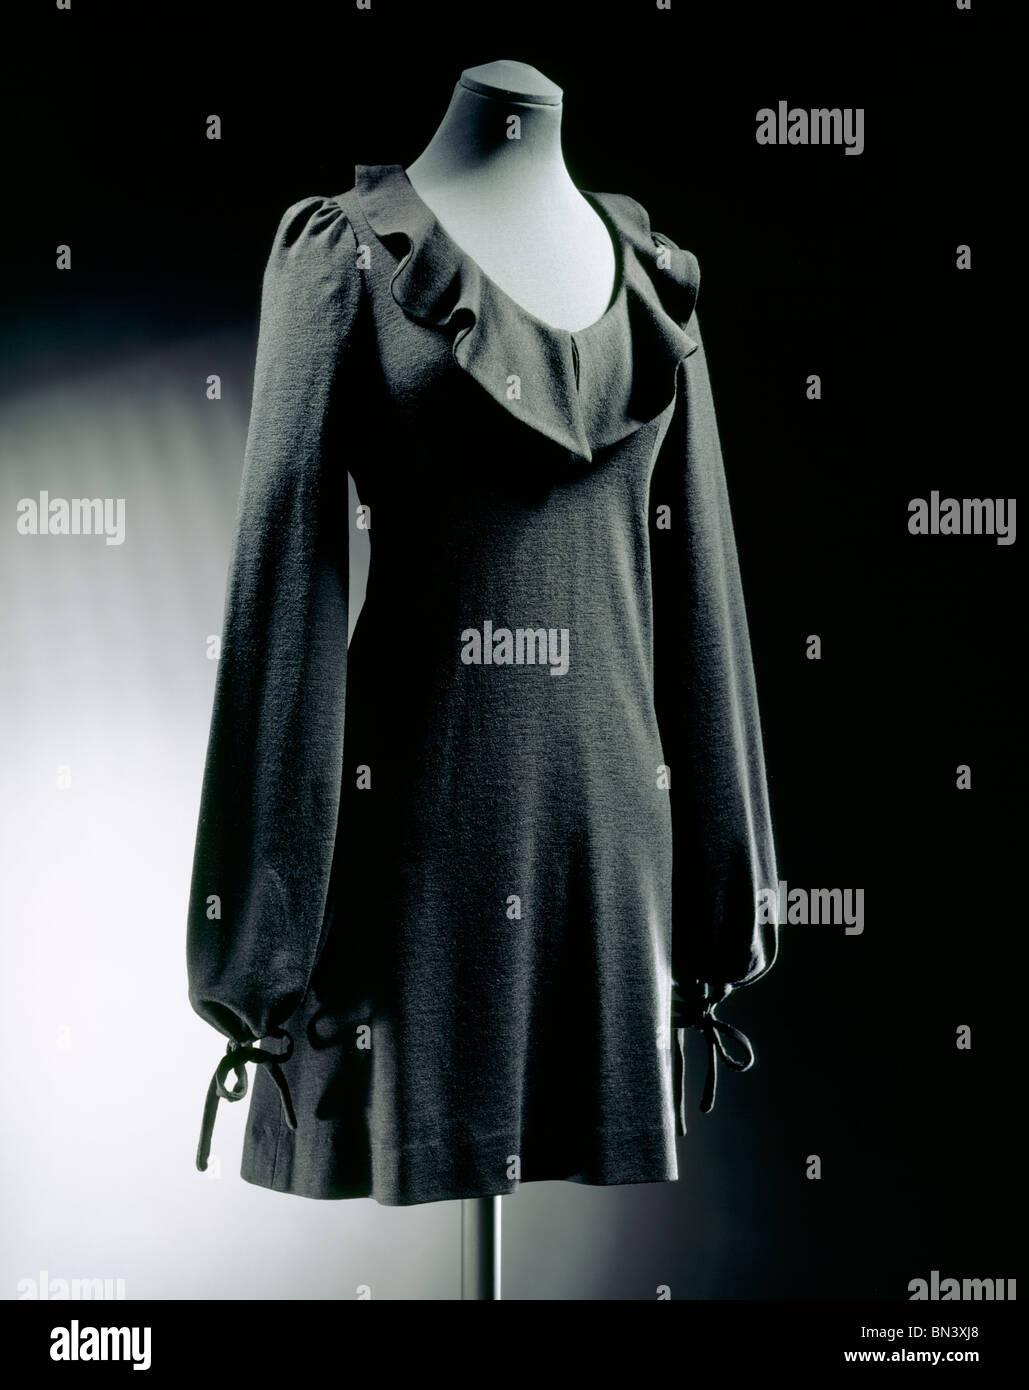 Mini Dress, by Biba. London, England, 1968. EDITORIAL USE ONLY - Stock Image